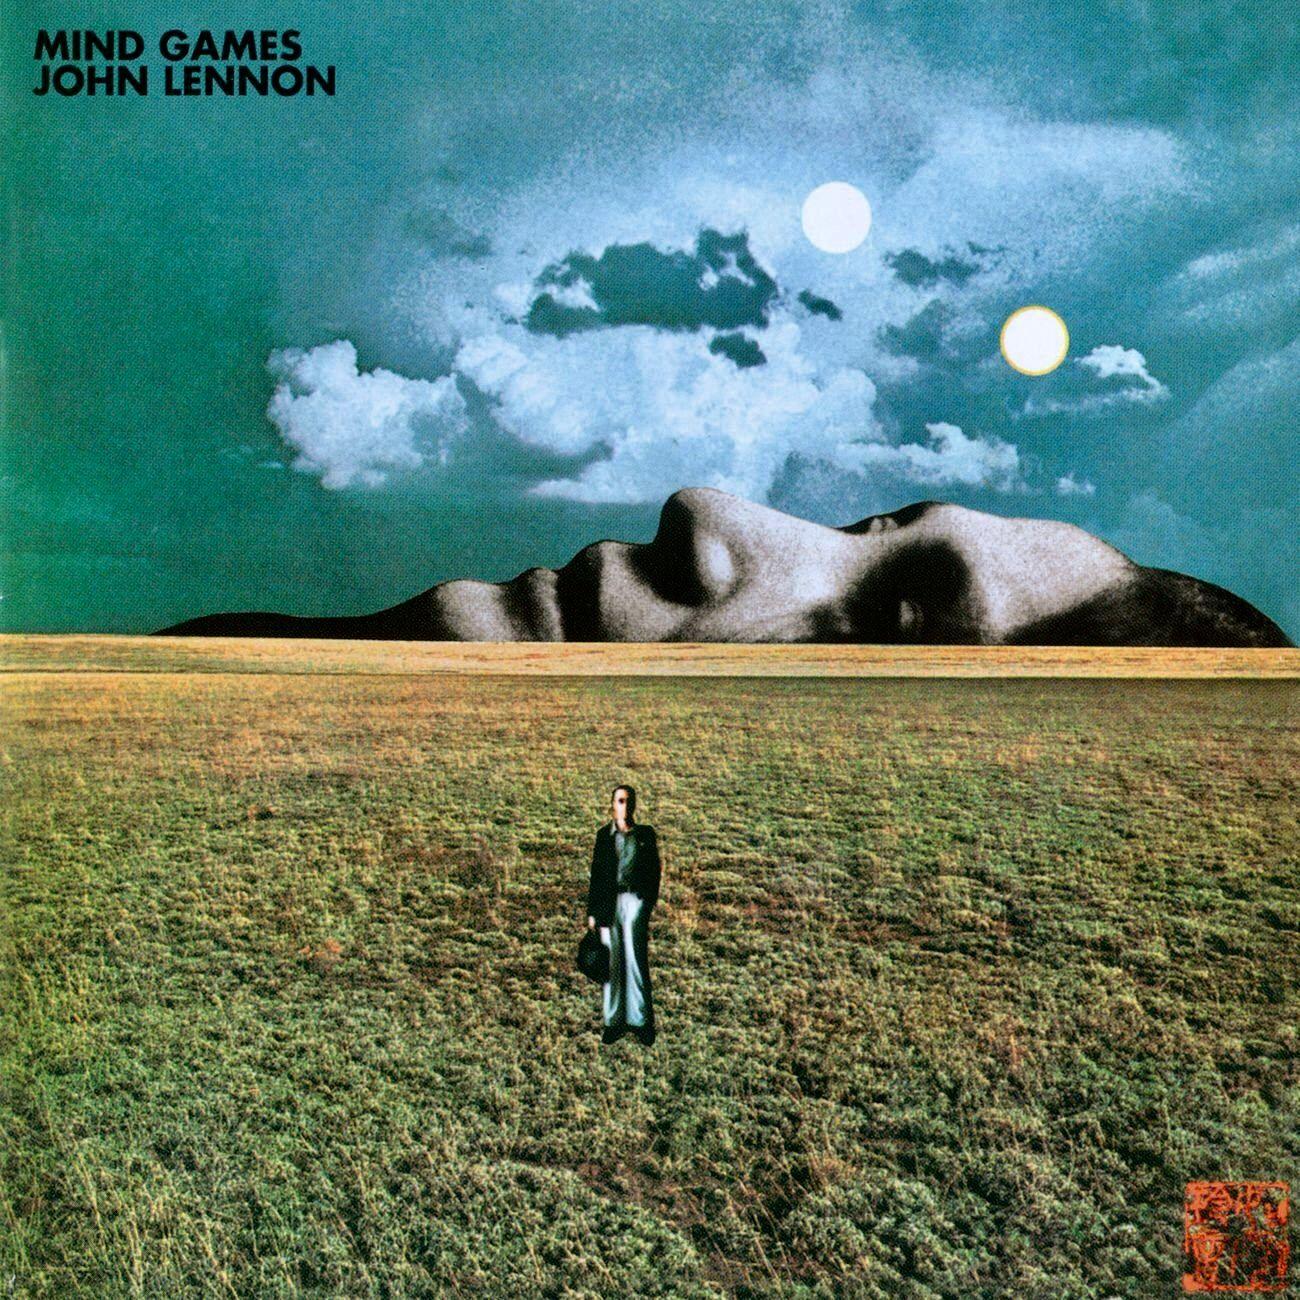 John Lennon Mind Games Classic Rock John Lennon Albums